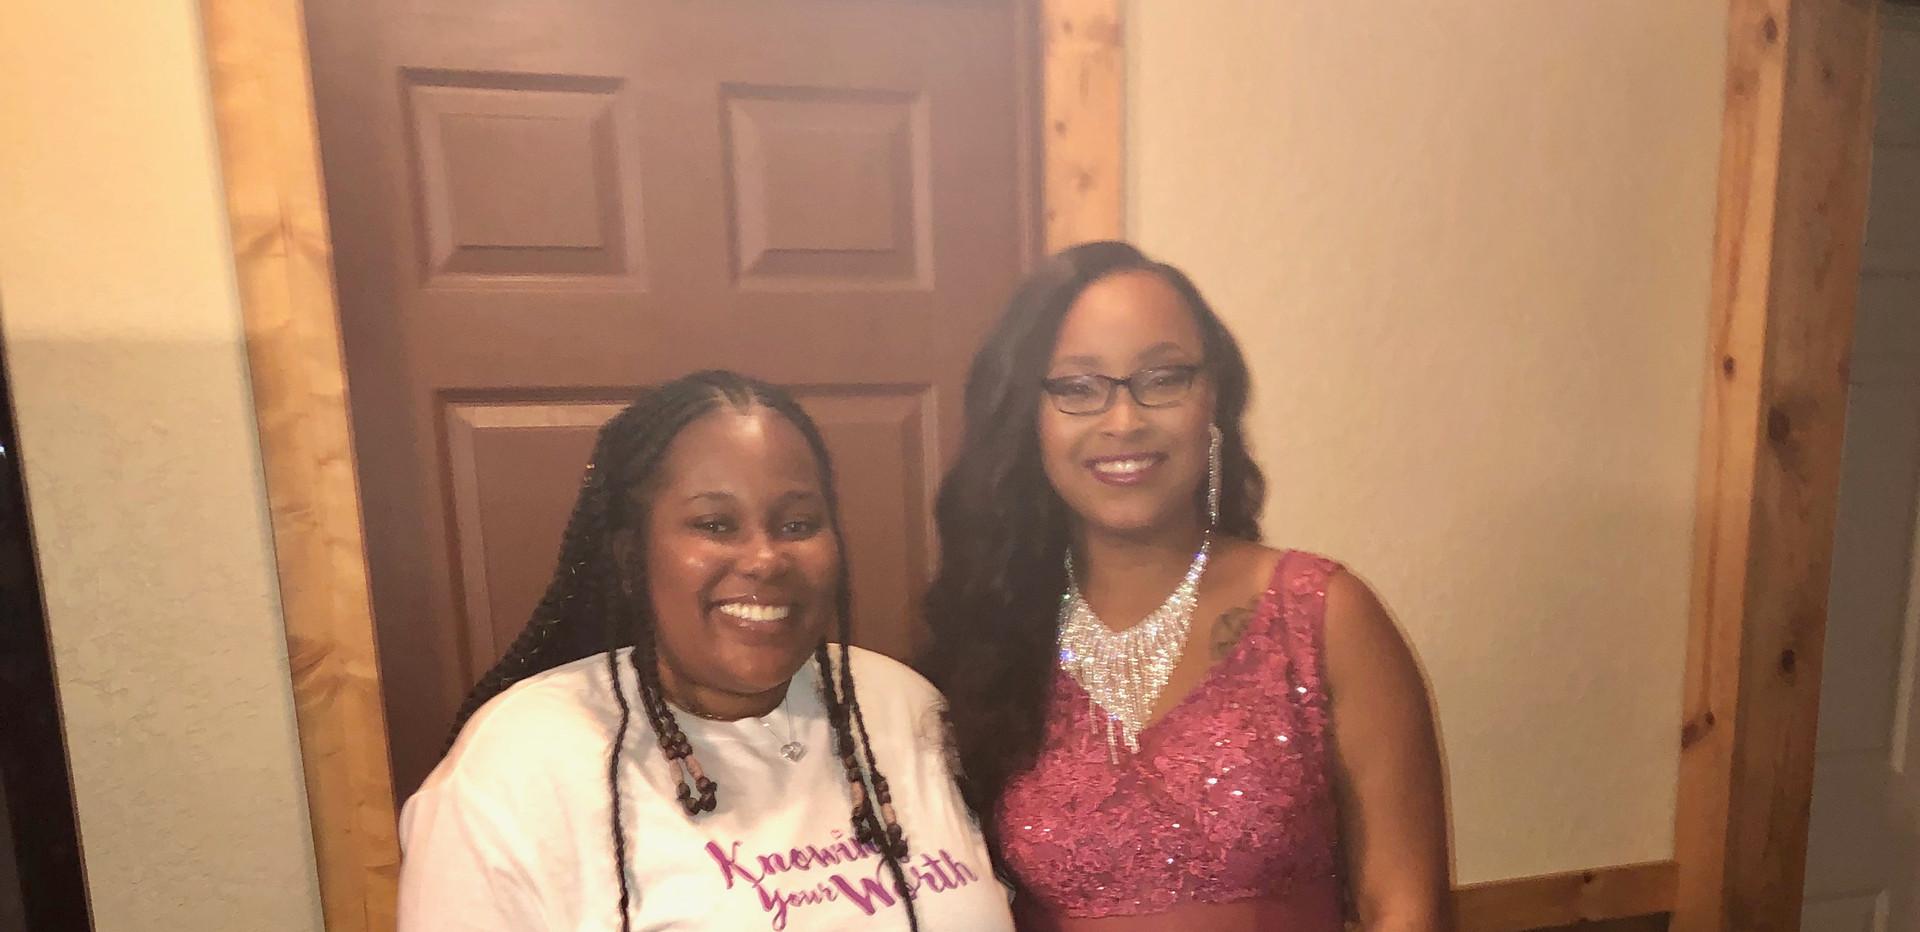 Project Prom Winner and Ambassador